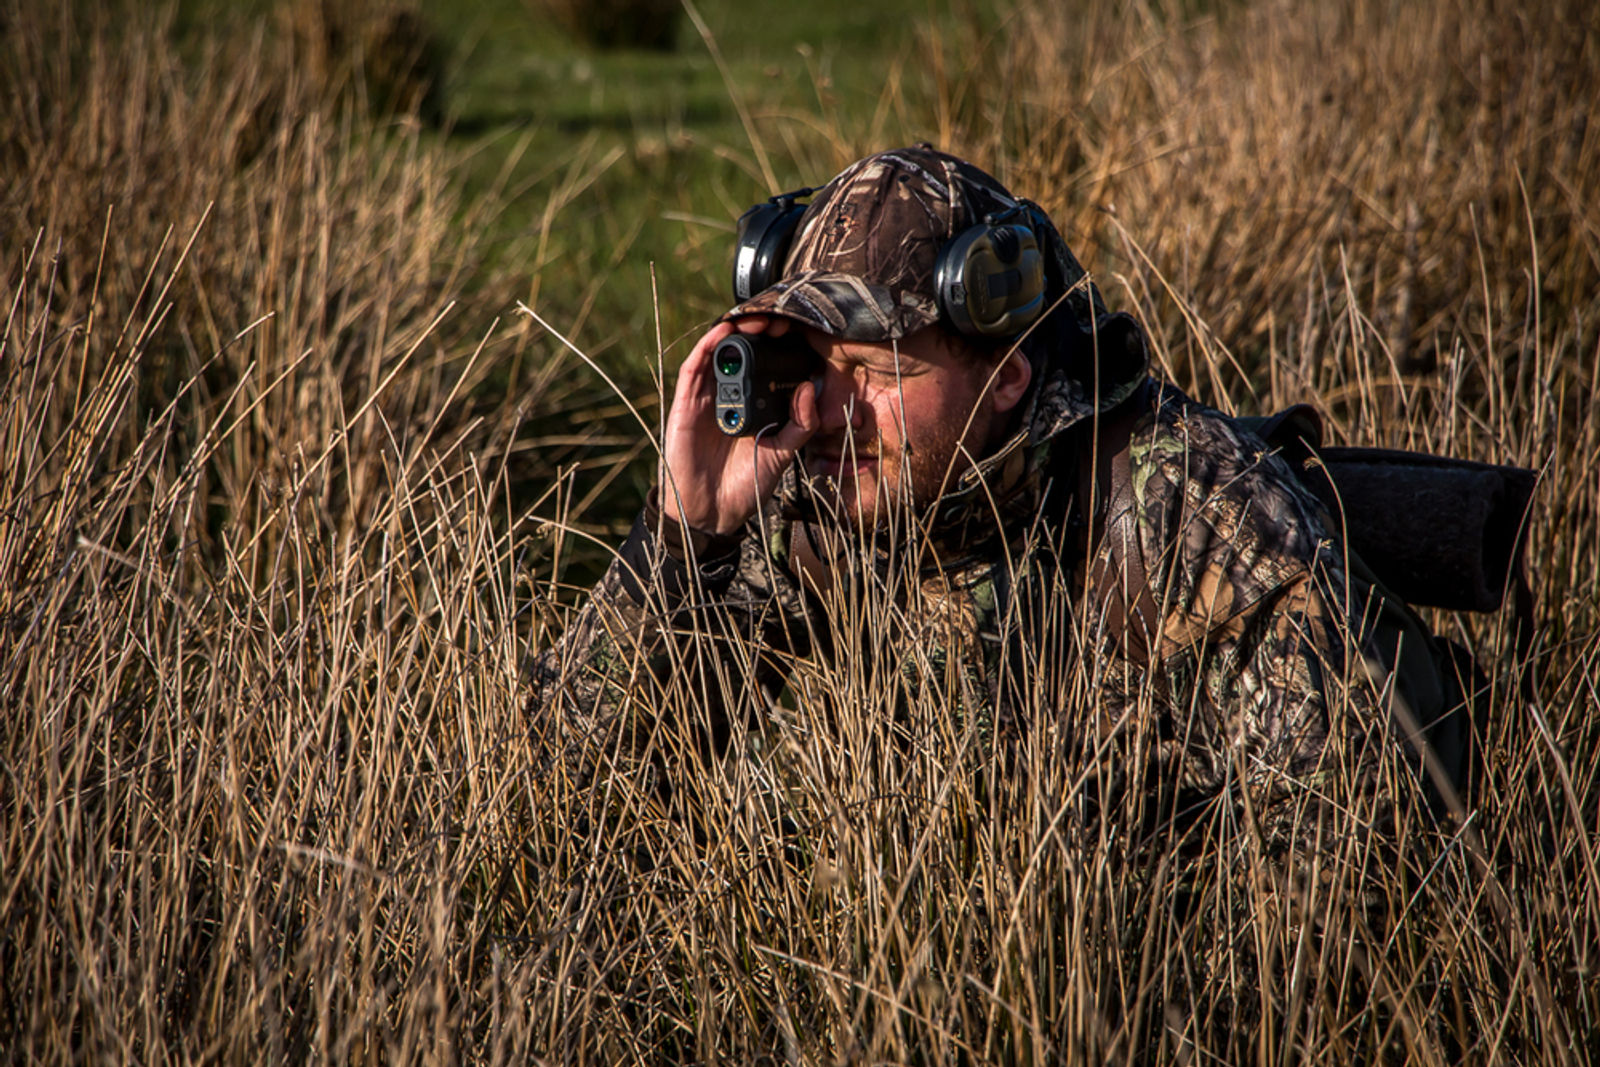 Leupold Entfernungsmesser Jagd : Entfernungsmesser u erx i tbr danu c von leupold